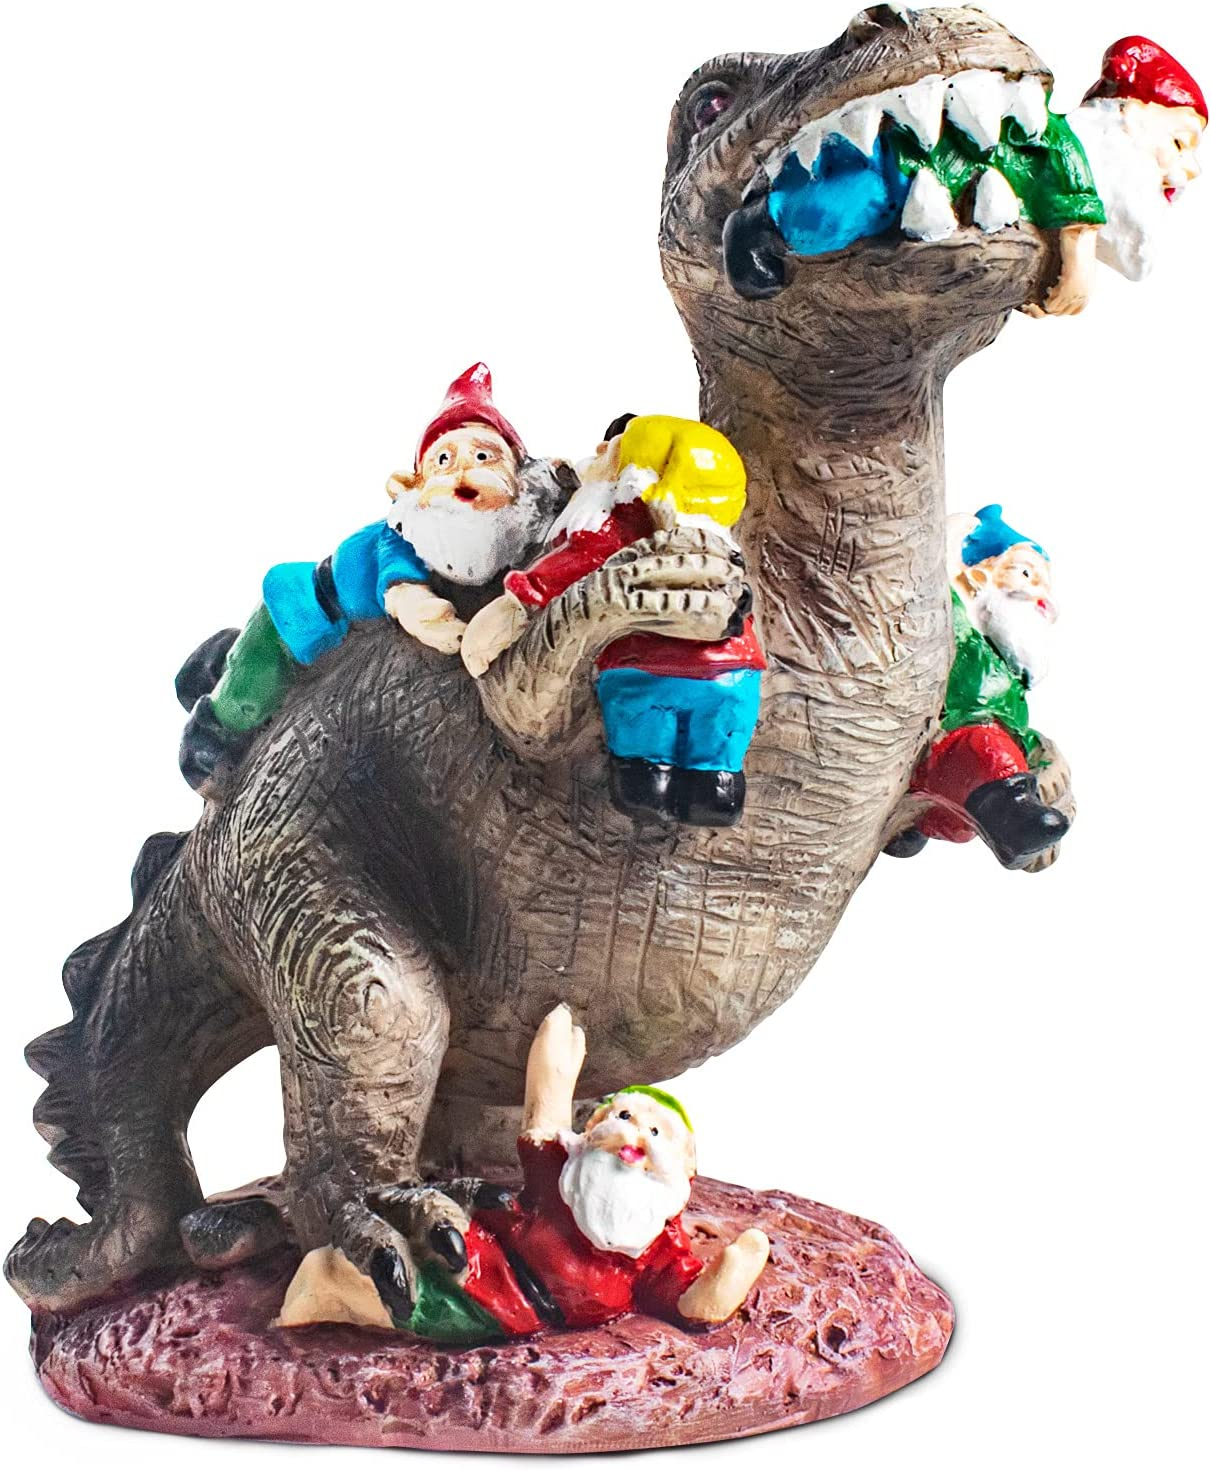 Garden Statue Dinosaur Eating Gnomes Outdoor Art Decor, Resin Dinosaur & Gnomes Figurines Sculpture Garden Fairy Miniature Decorative Ornaments